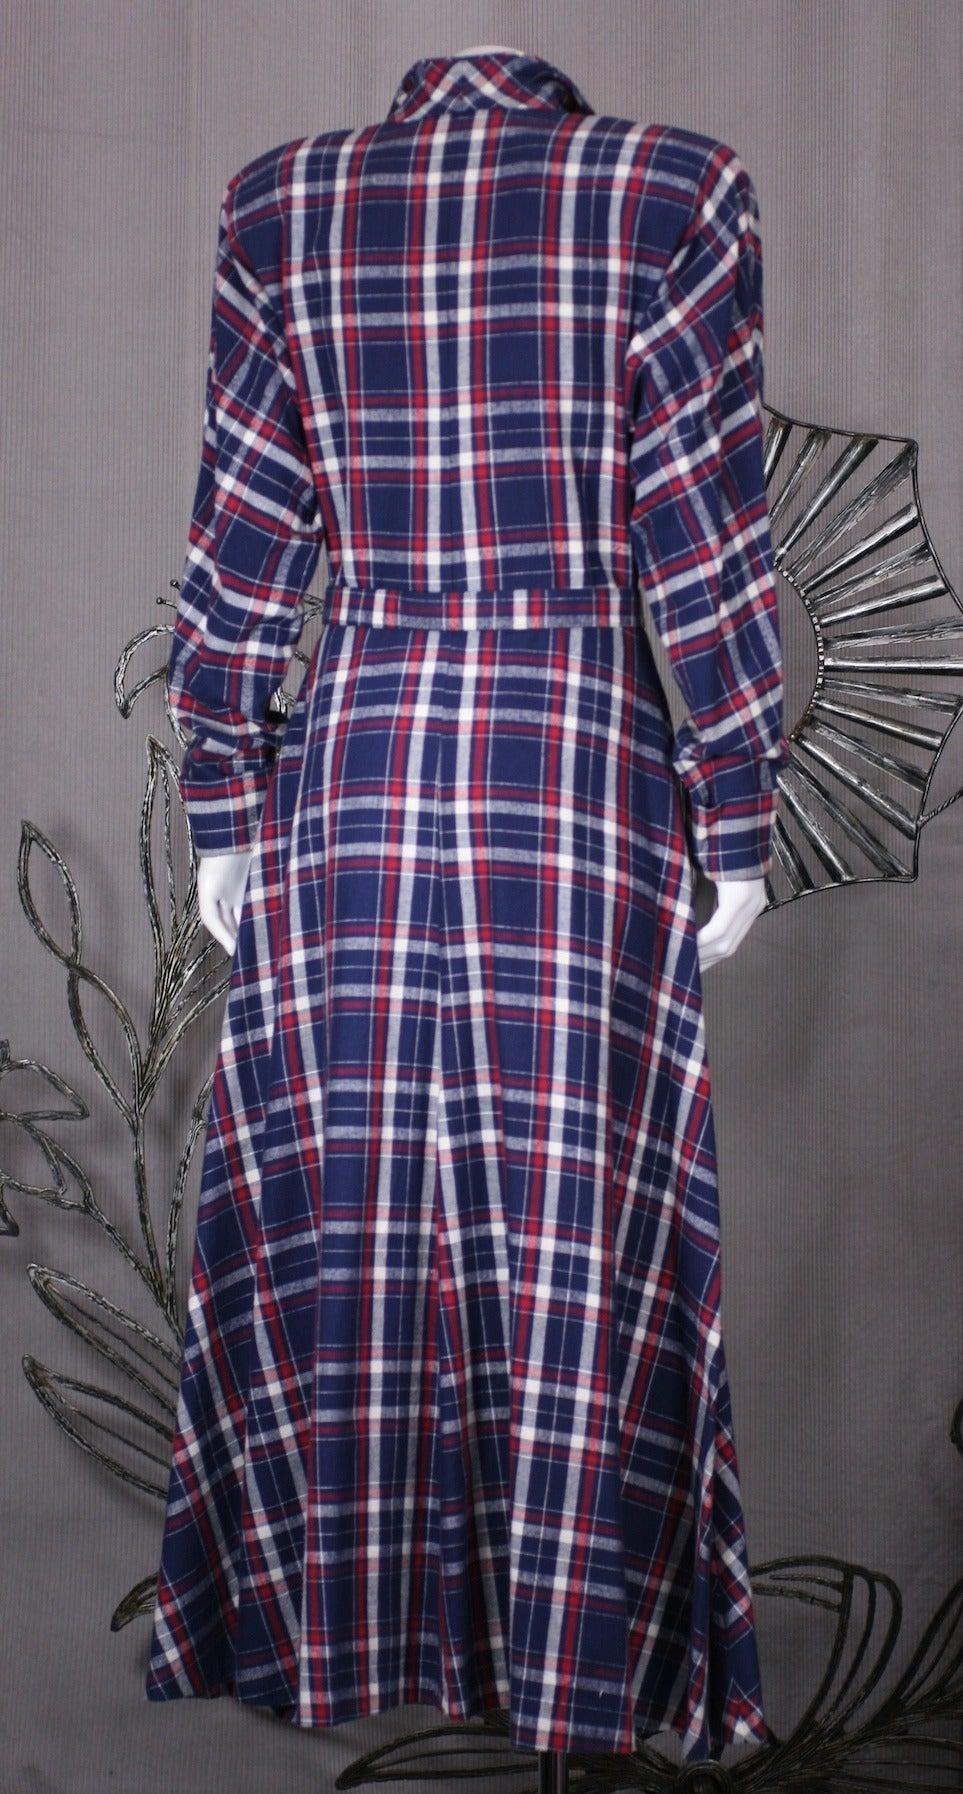 Women's Norma Kamali's Patriotic Flannel Shirtwaist